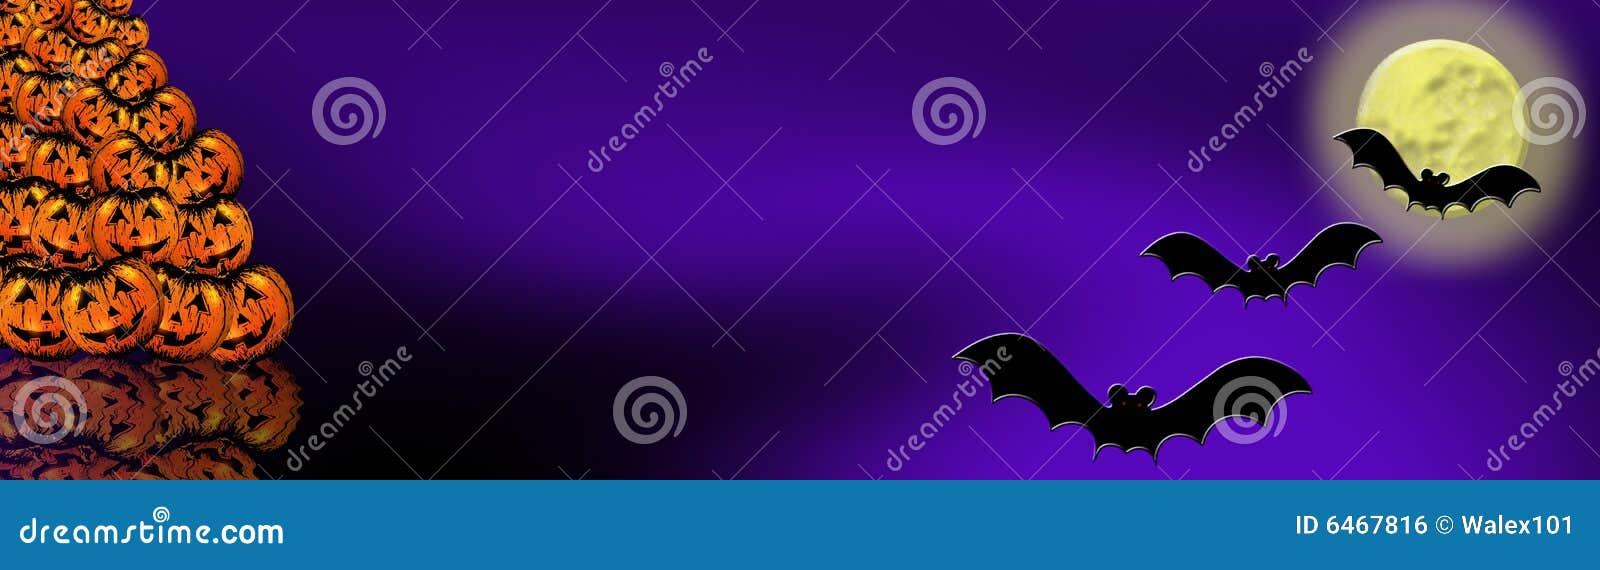 6 banner Halloween.